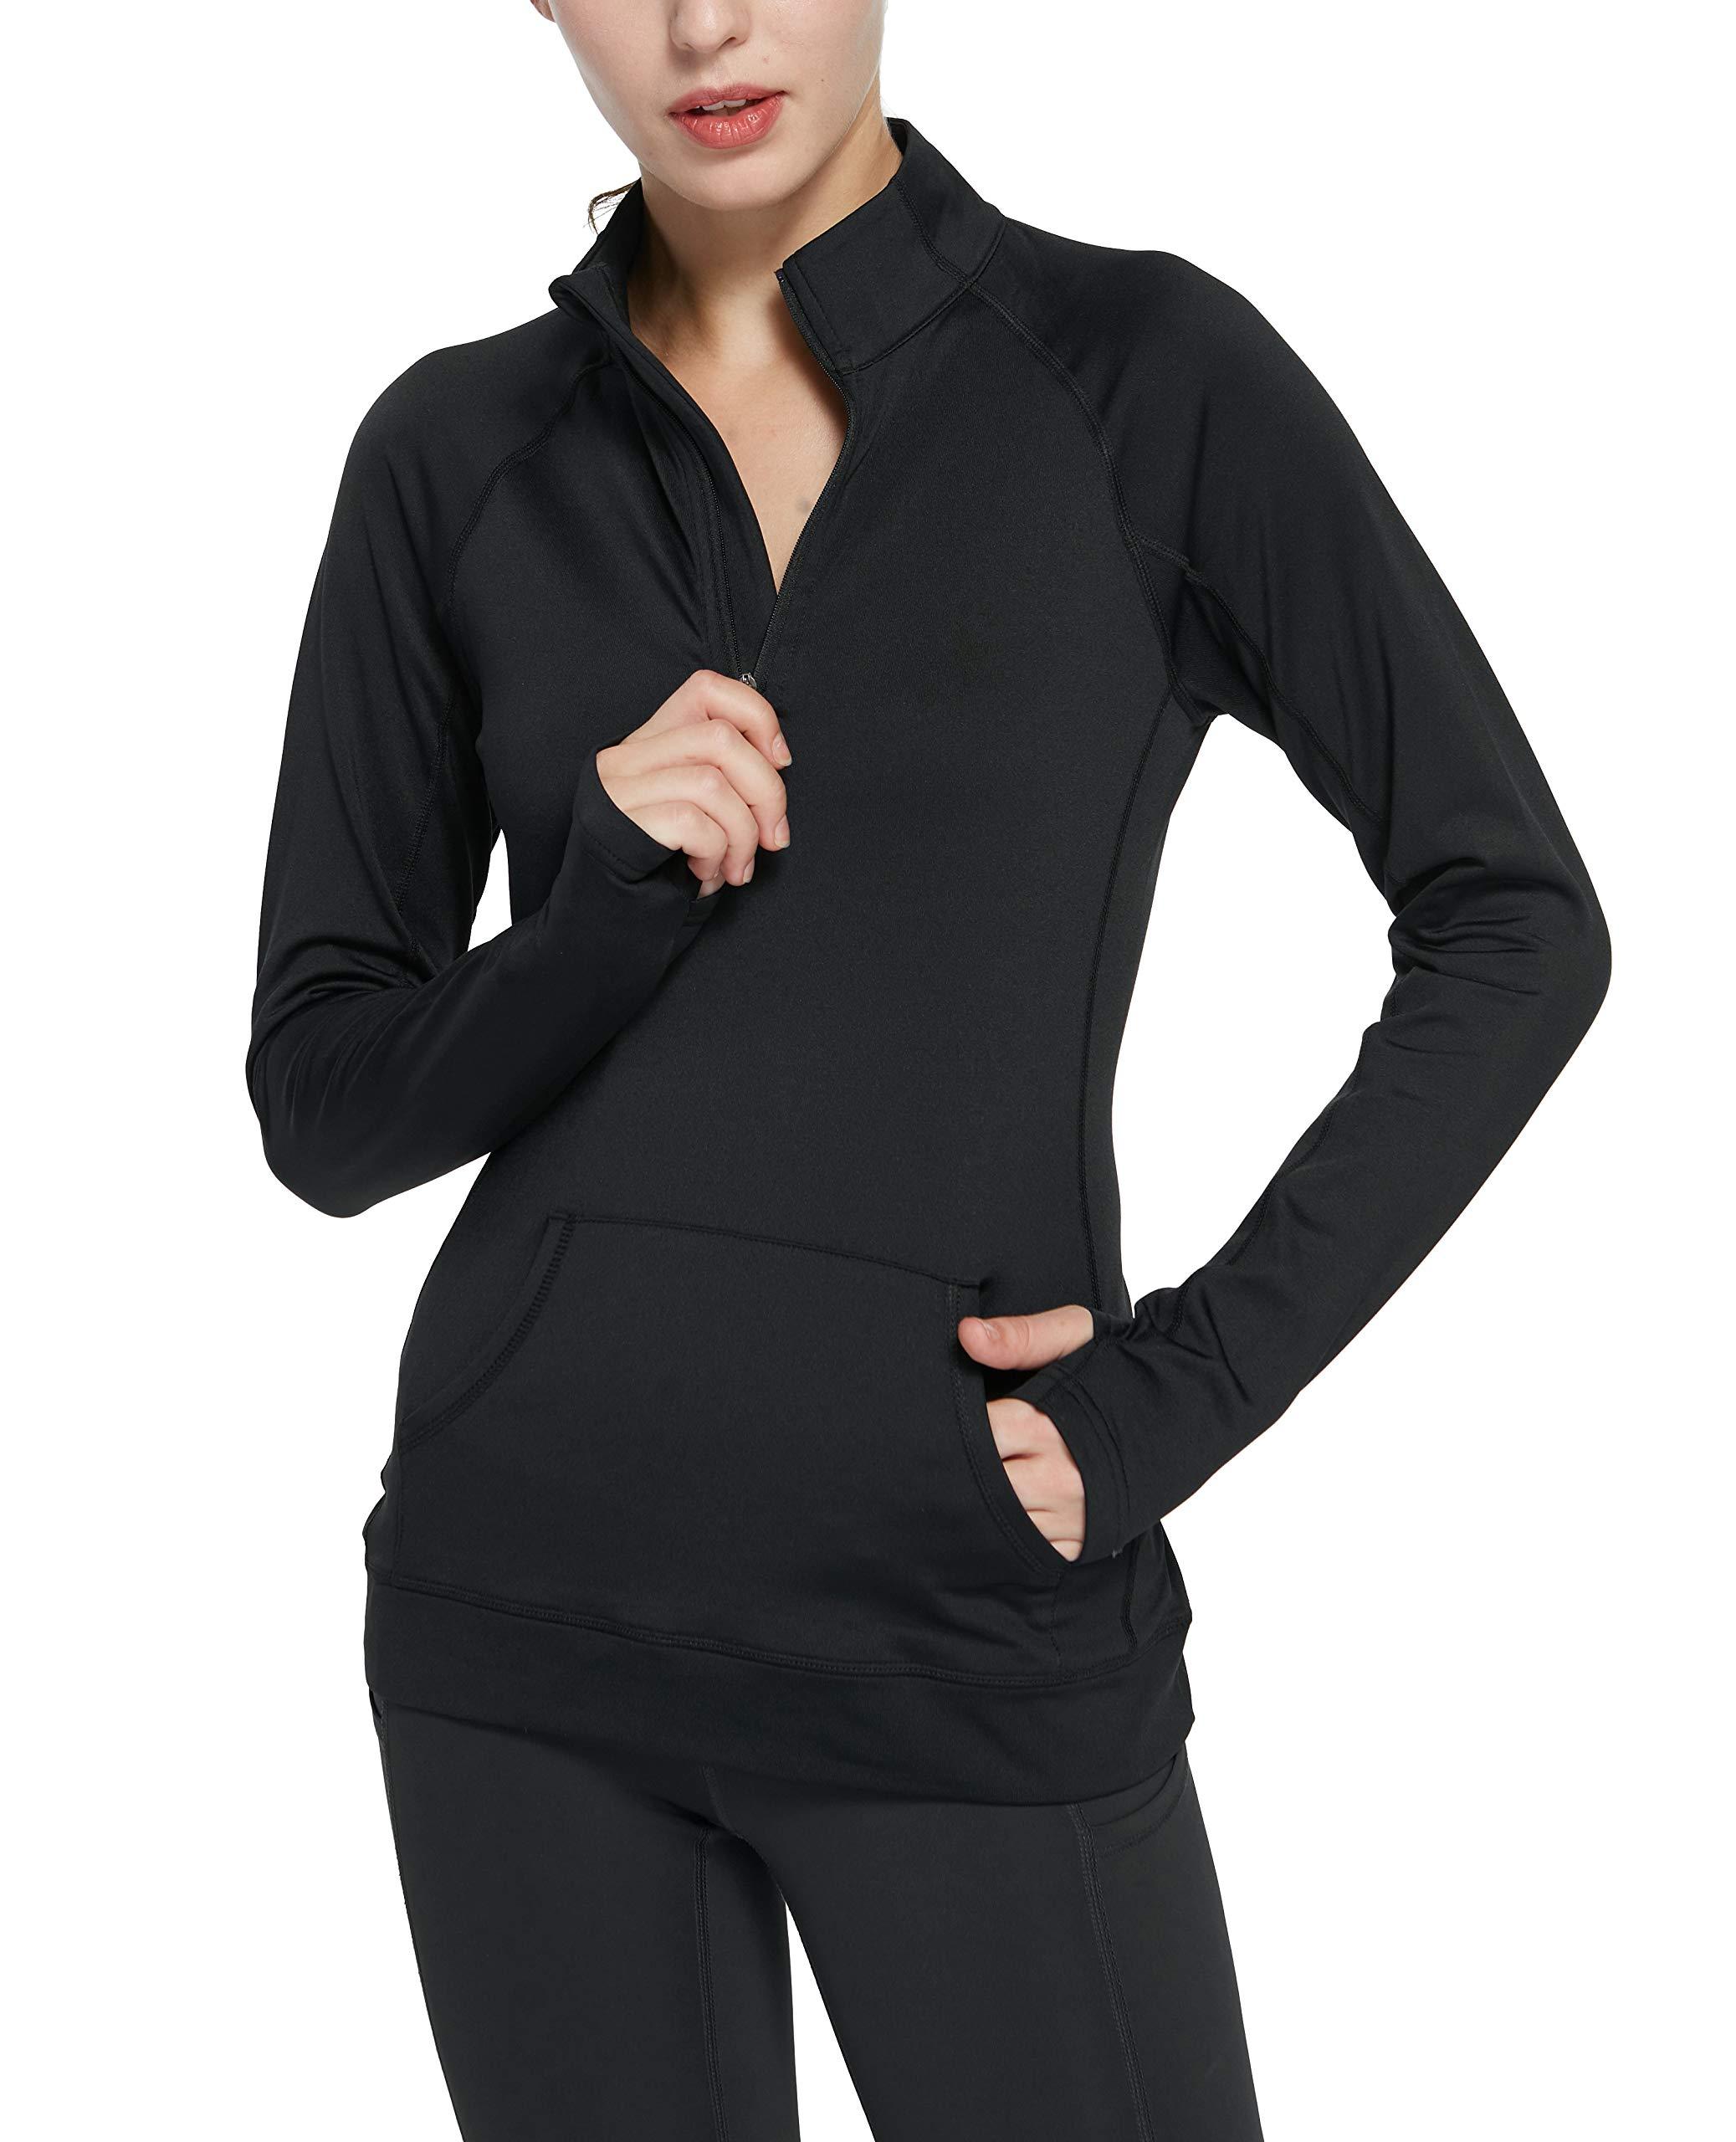 Cityoung Women's Yoga Long Sleeves Half Zip Sweatshirt Fleece Athletic Workout Running Track Jacket m bk by Cityoung